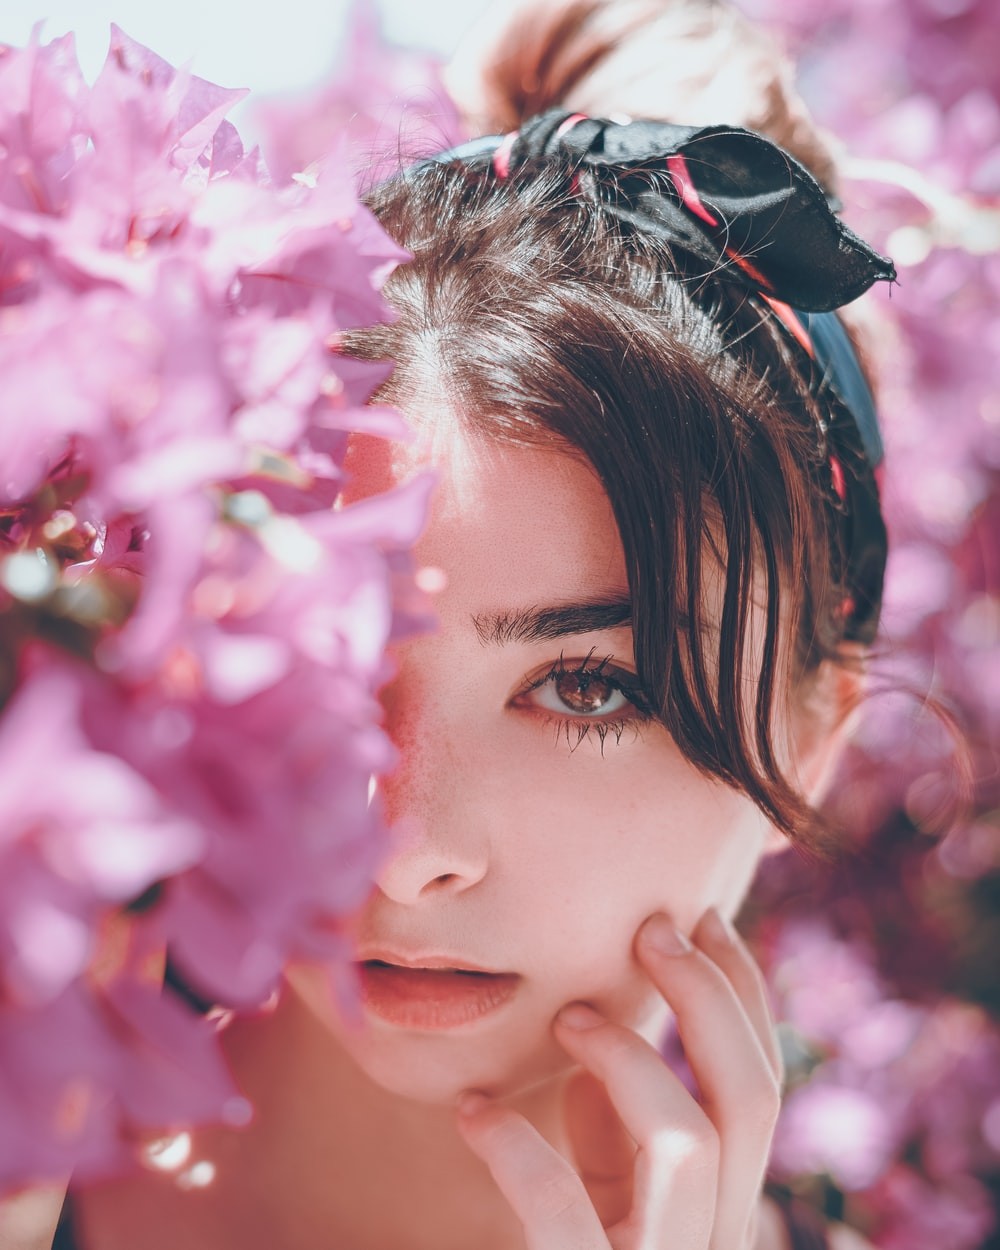 woman hiding on pink petaled flowers